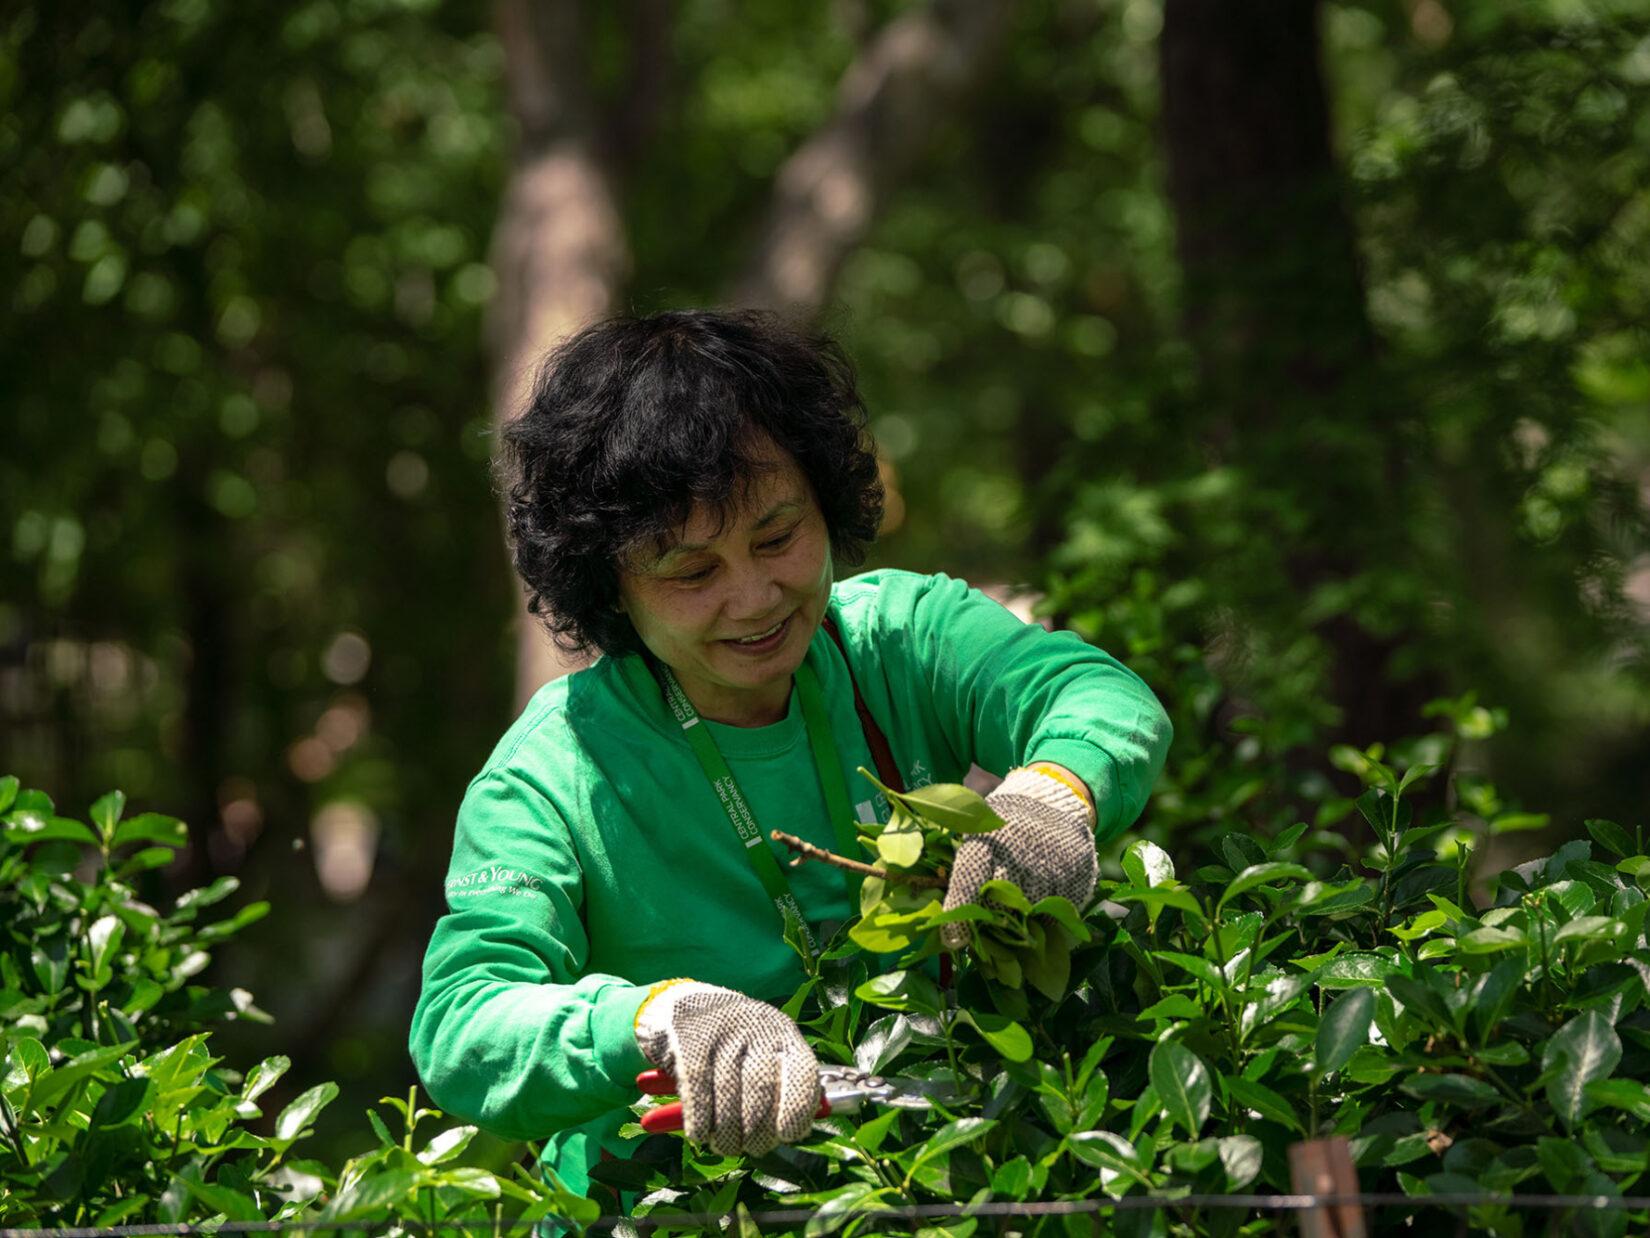 A volunteer in a green Conservancy sweatshirt prunes a bush